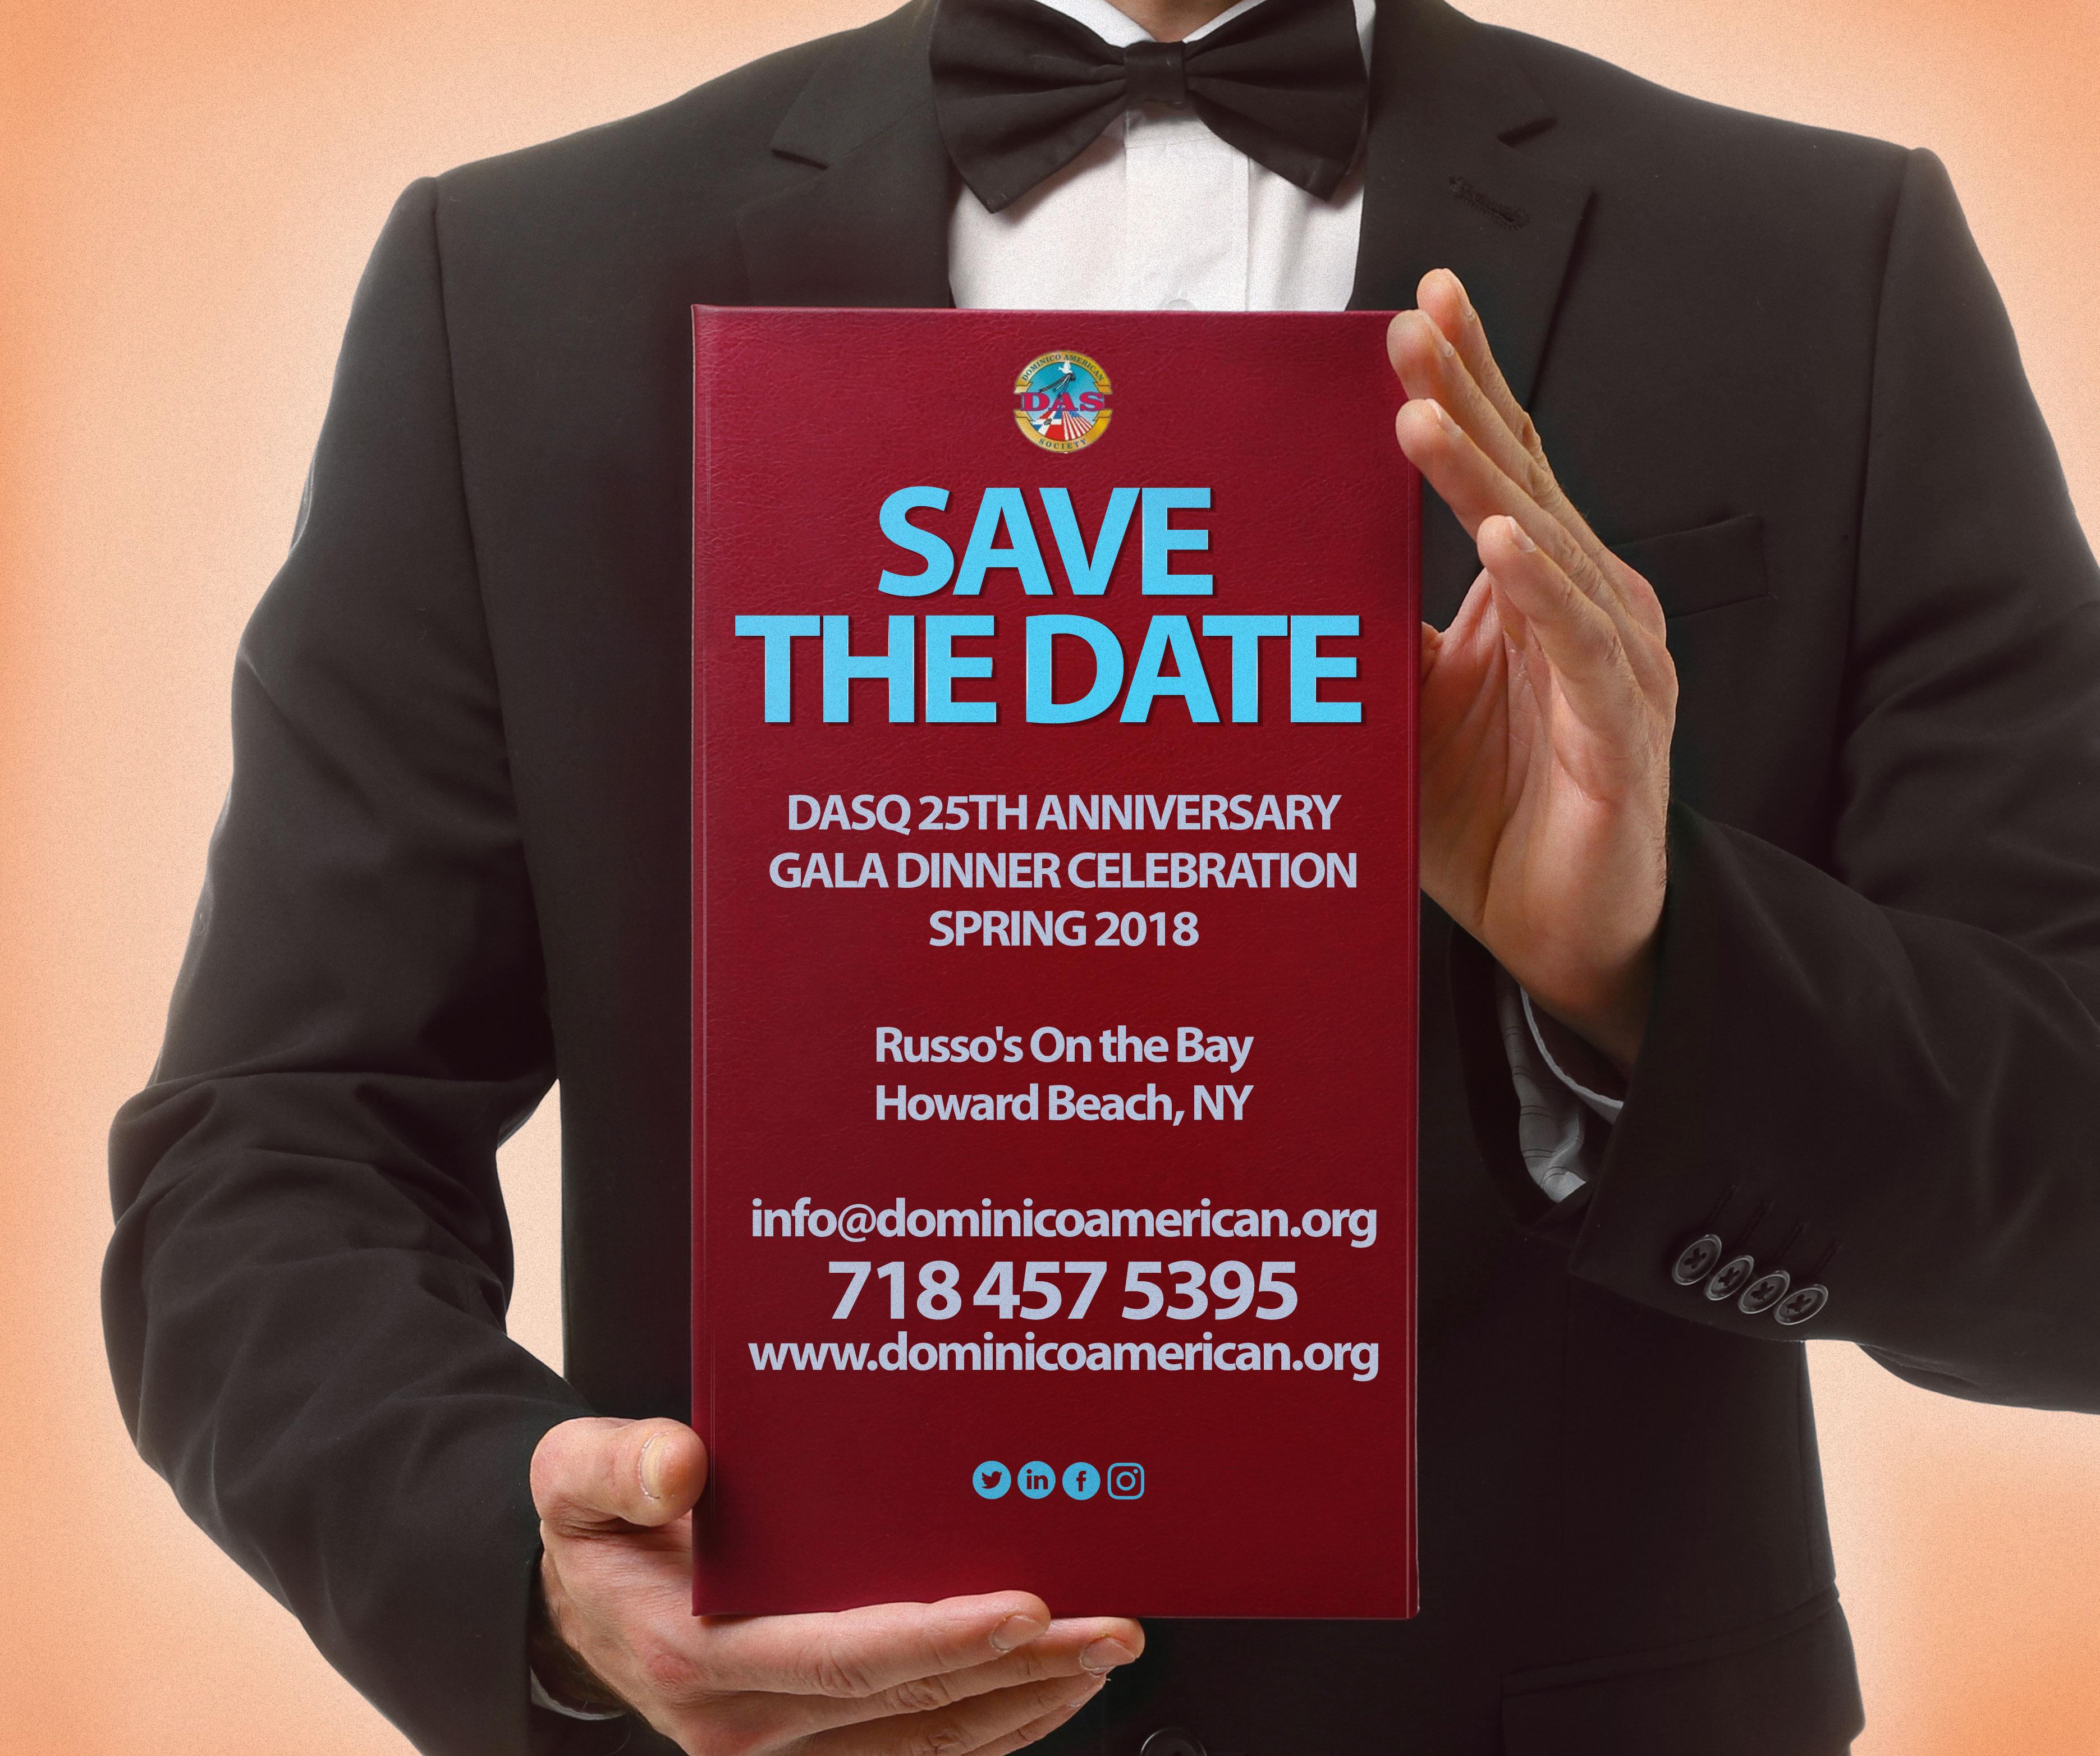 2018 DASQ 25th Anniversary Gala